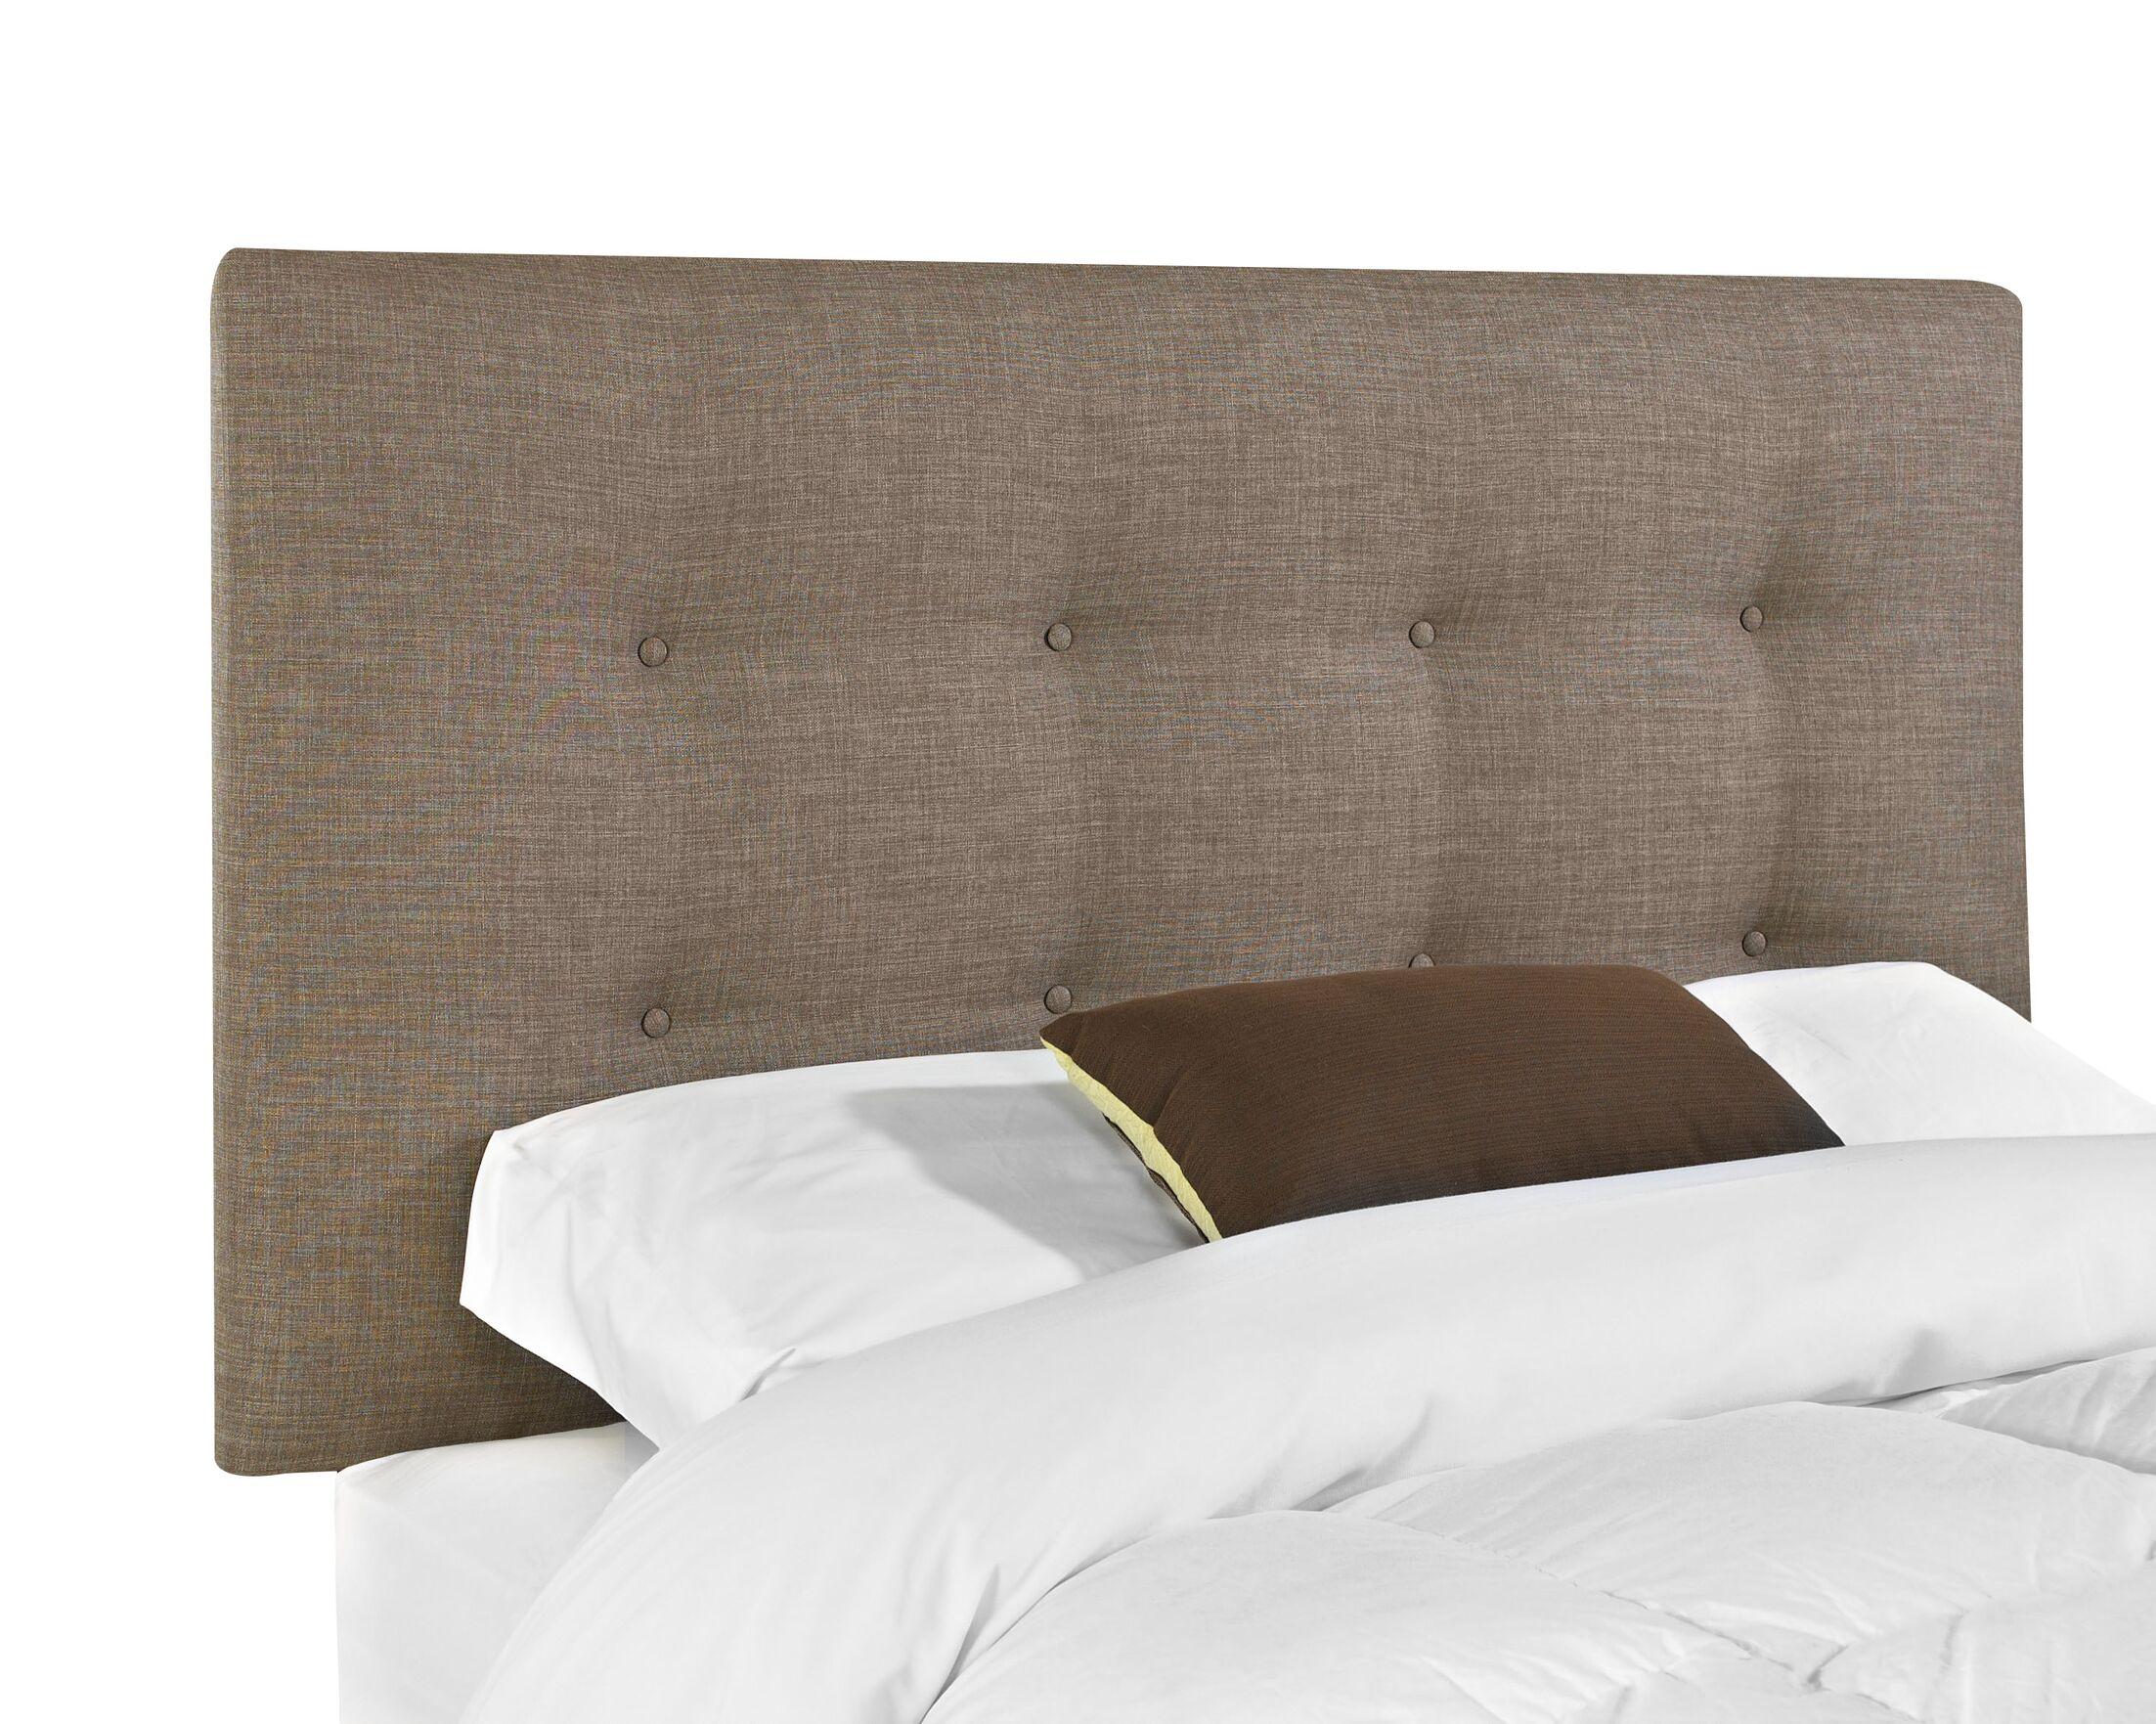 Belfast Upholstered Panel Headboard Upholstery: Stone, Size: King